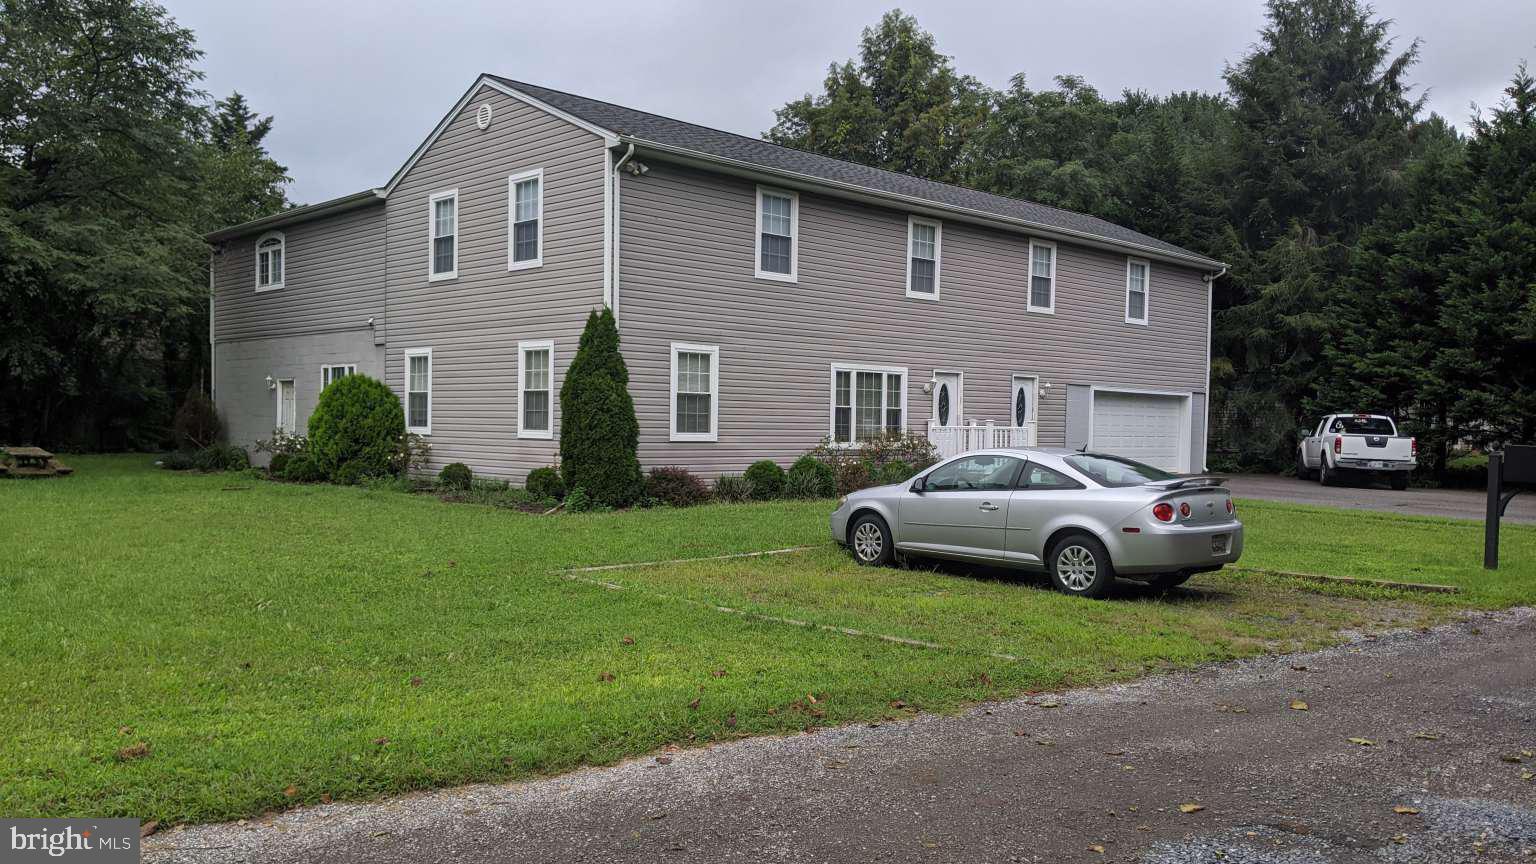 1 CARNENE ROAD, PASADENA, Maryland 21122, 6 Bedrooms Bedrooms, ,5 BathroomsBathrooms,Single Family,For Sale,1 CARNENE ROAD,MDAA454576